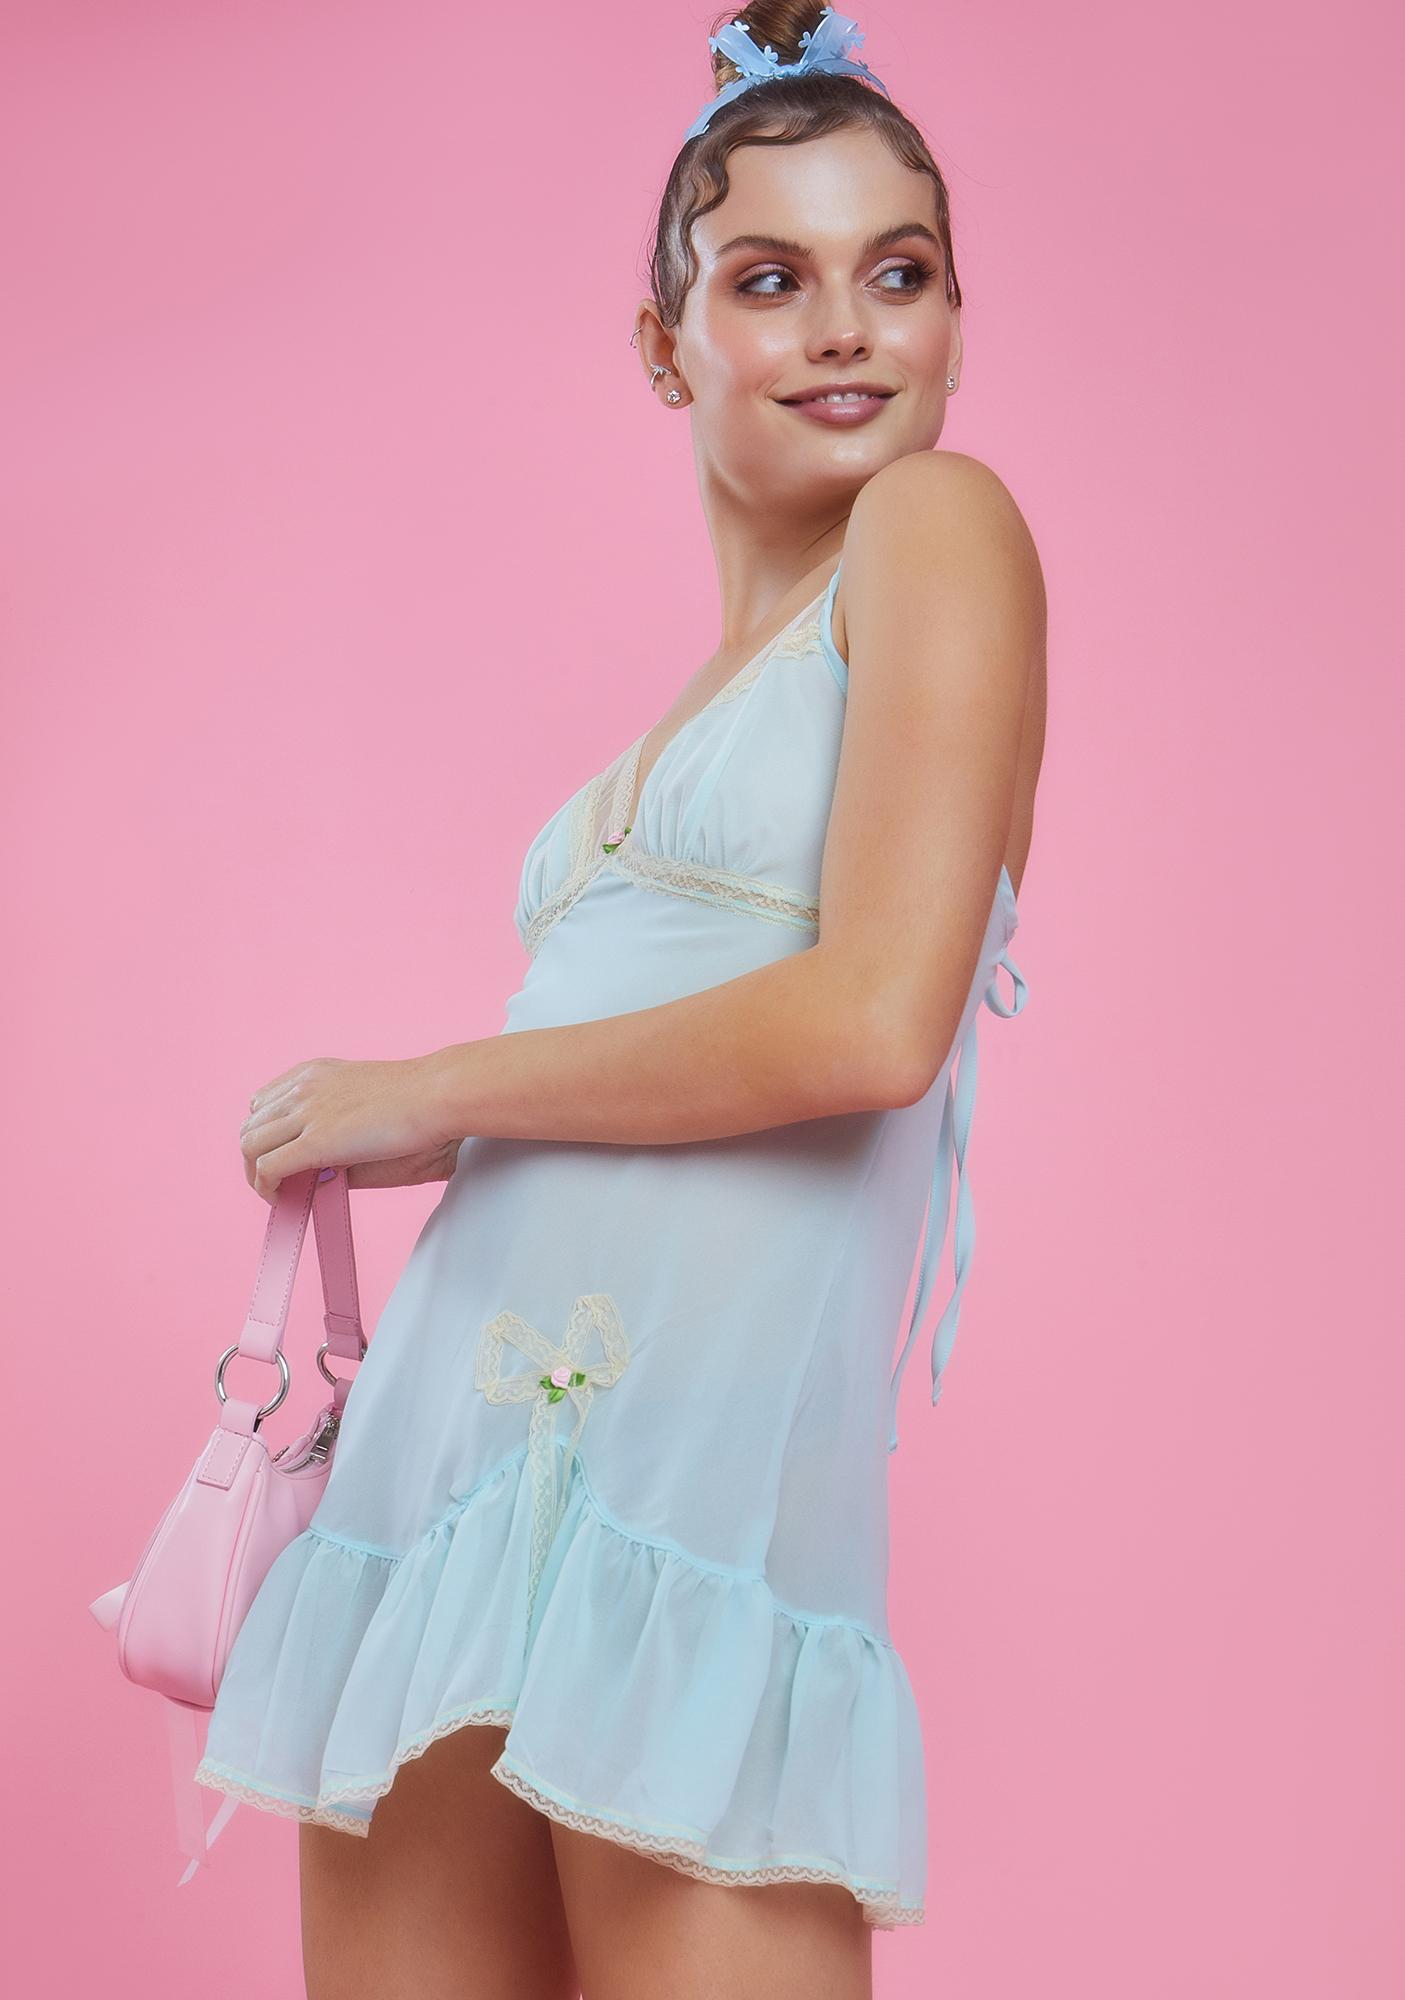 Sugar Thrillz Gloss And Turn Babydoll Dress